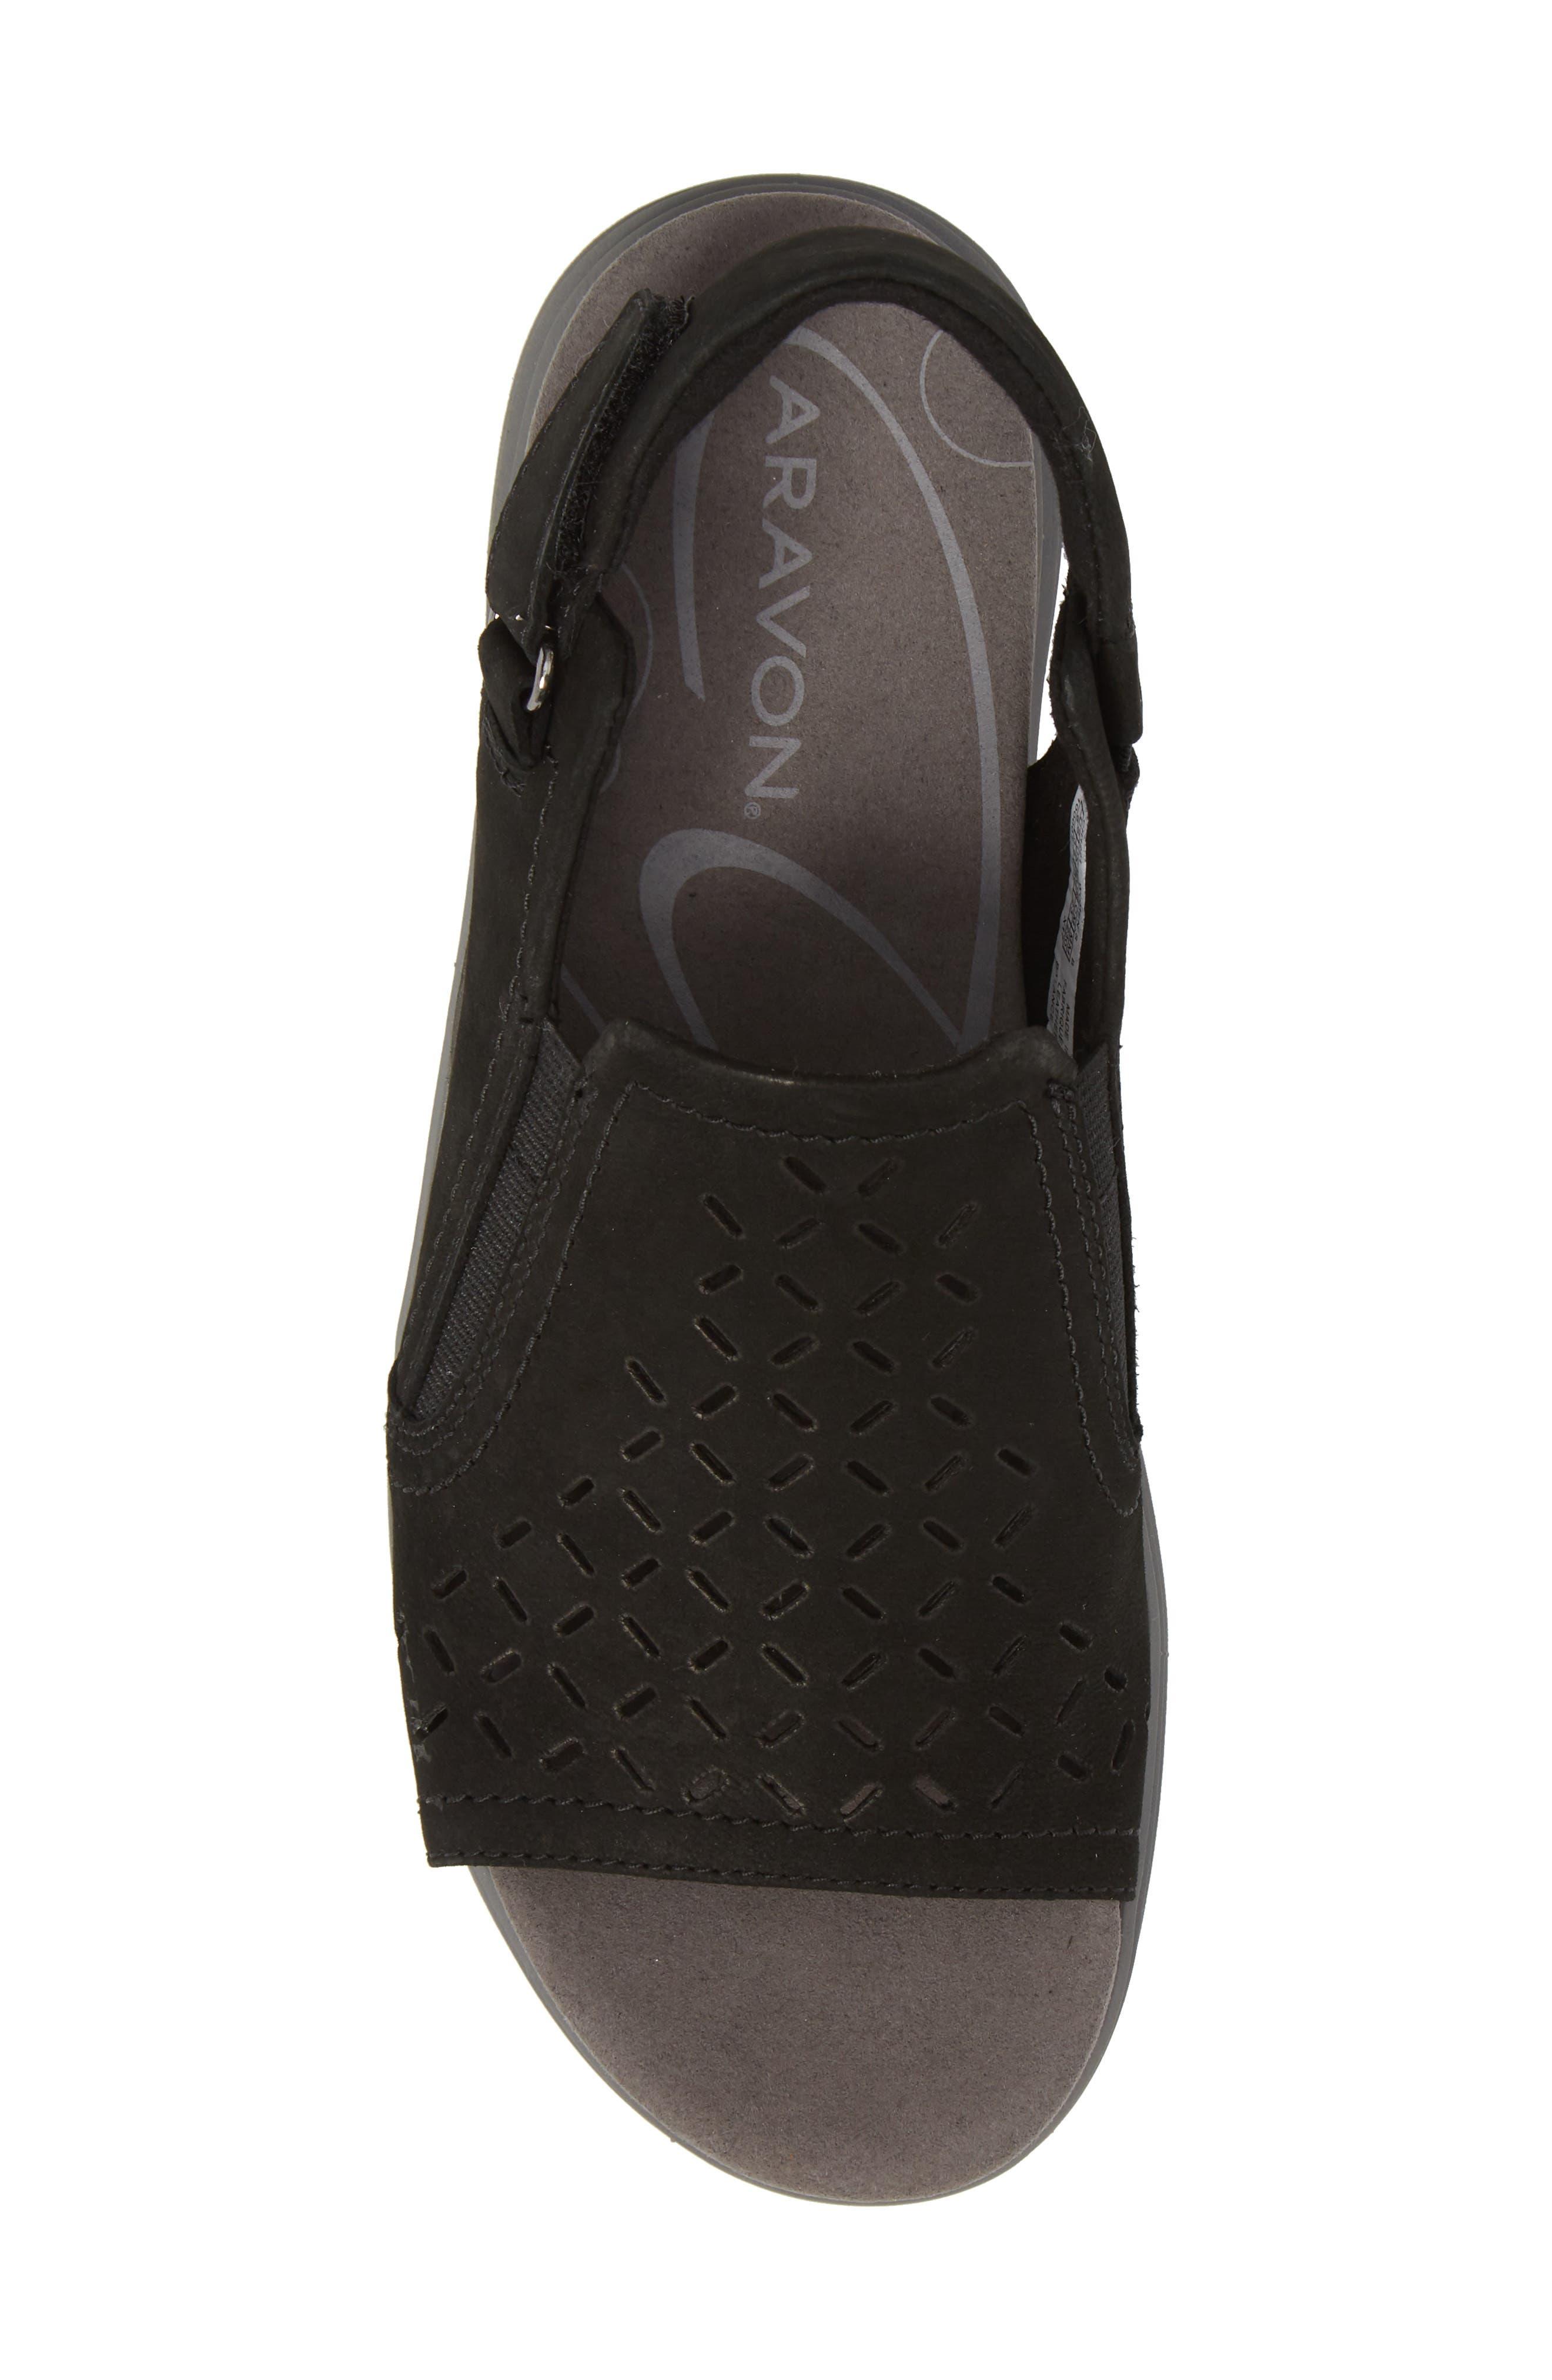 Beaumont Slingback Sandal,                             Alternate thumbnail 5, color,                             Black Nubuck Leather